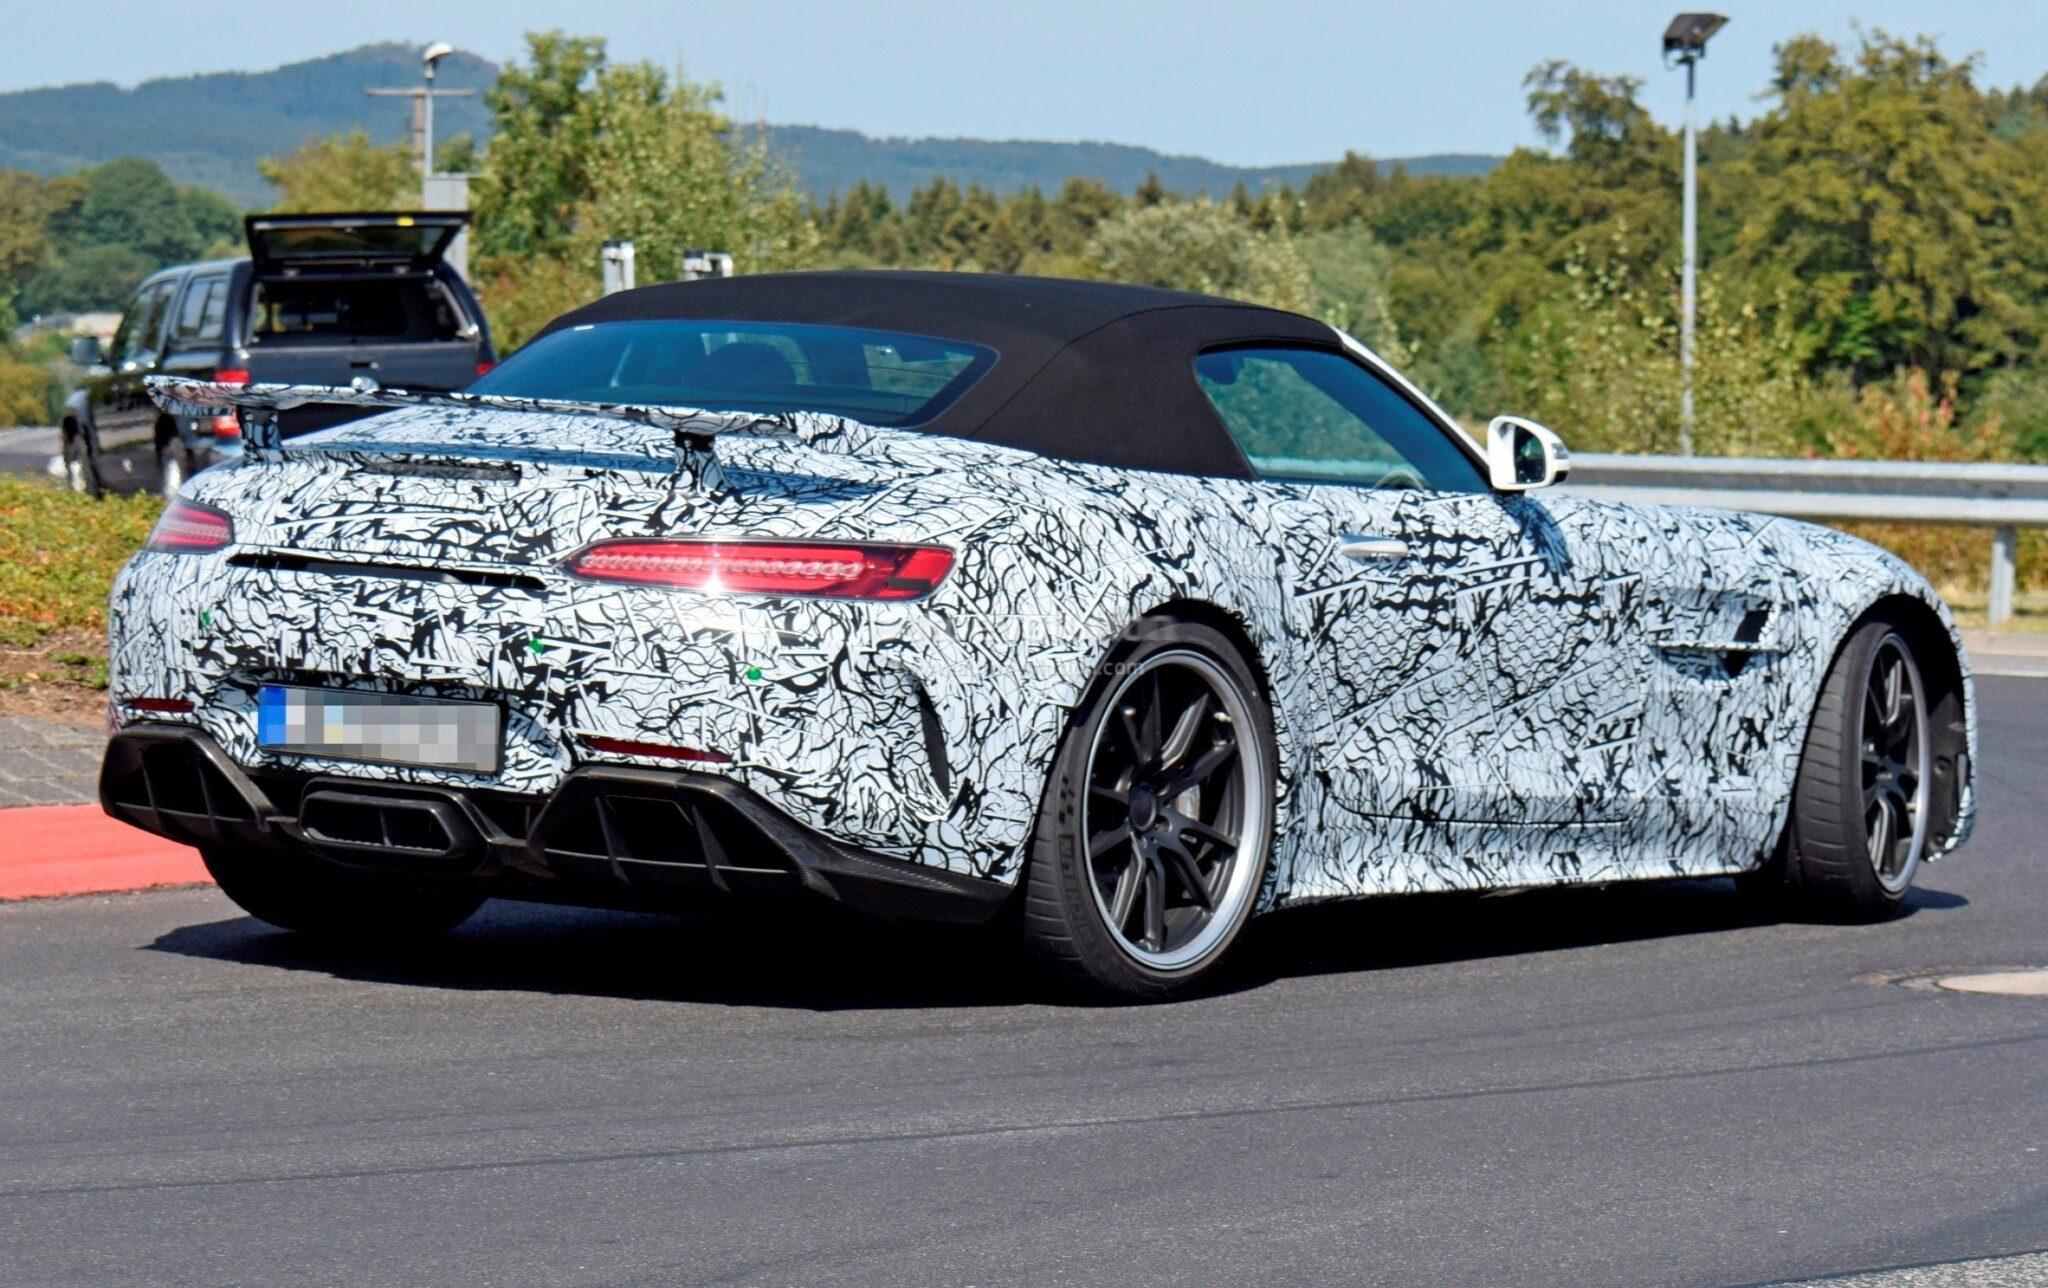 Mercedes-AMG GT R Roadster conferma